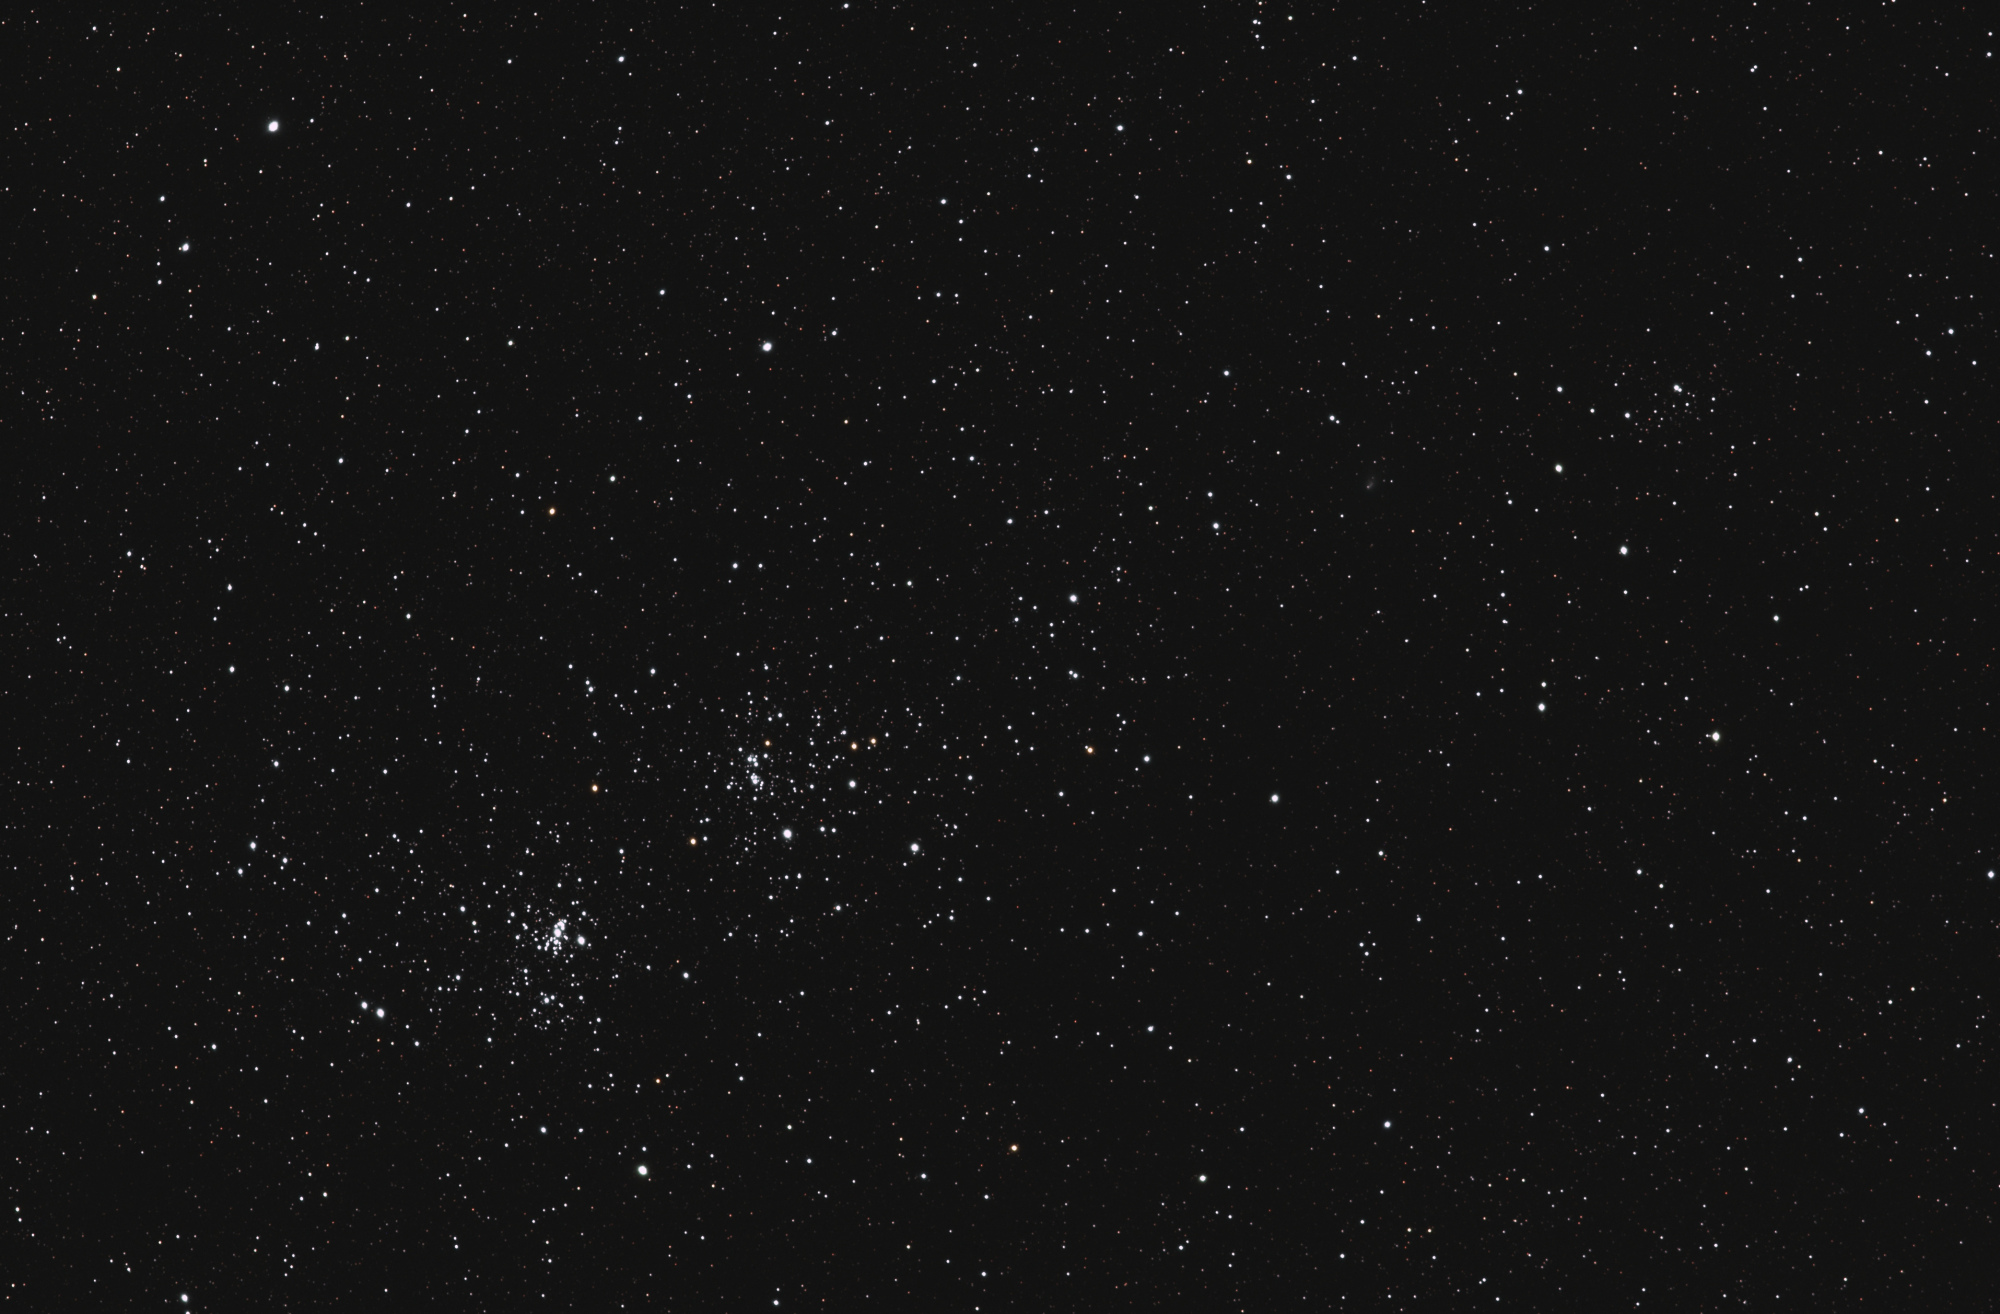 comete_T2_Double_amas_s.thumb.jpg.5513466ab90439e43e642002bb7e3622.jpg